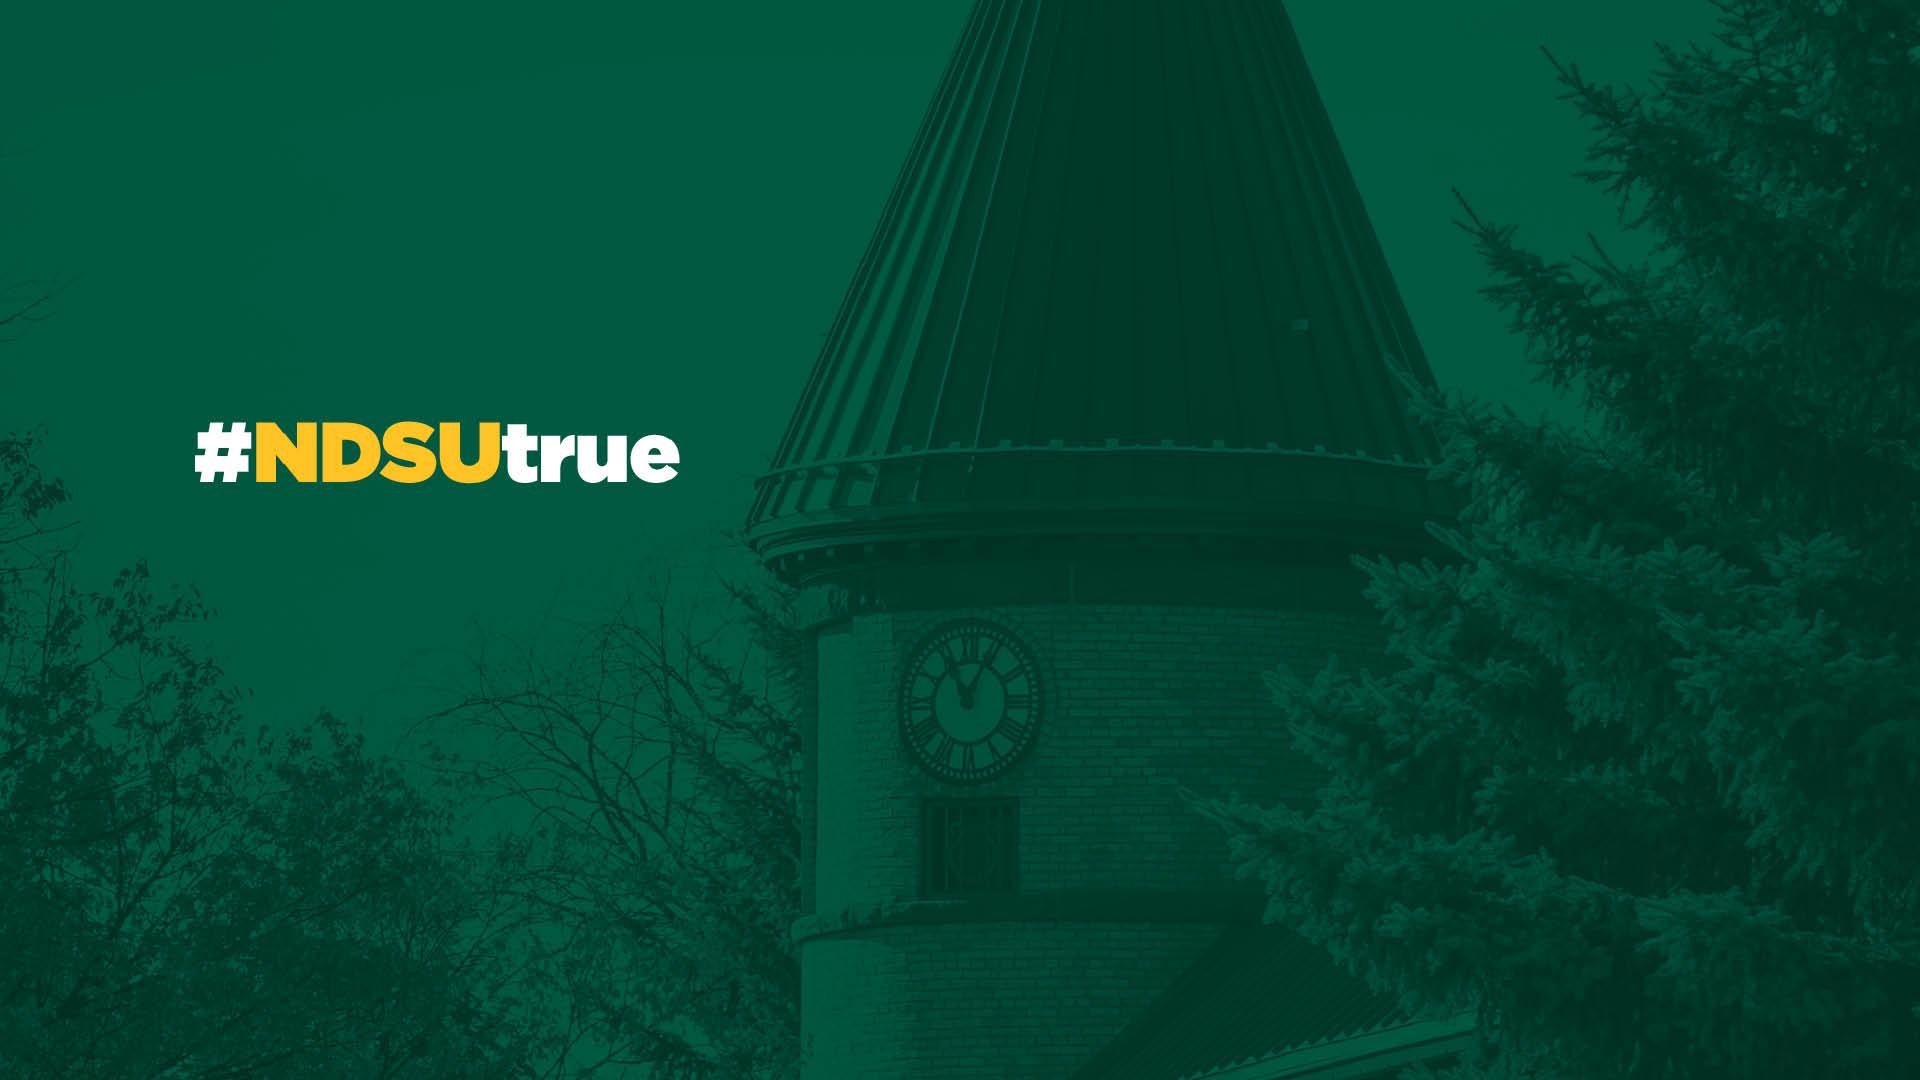 wallpaper | university relations | ndsu